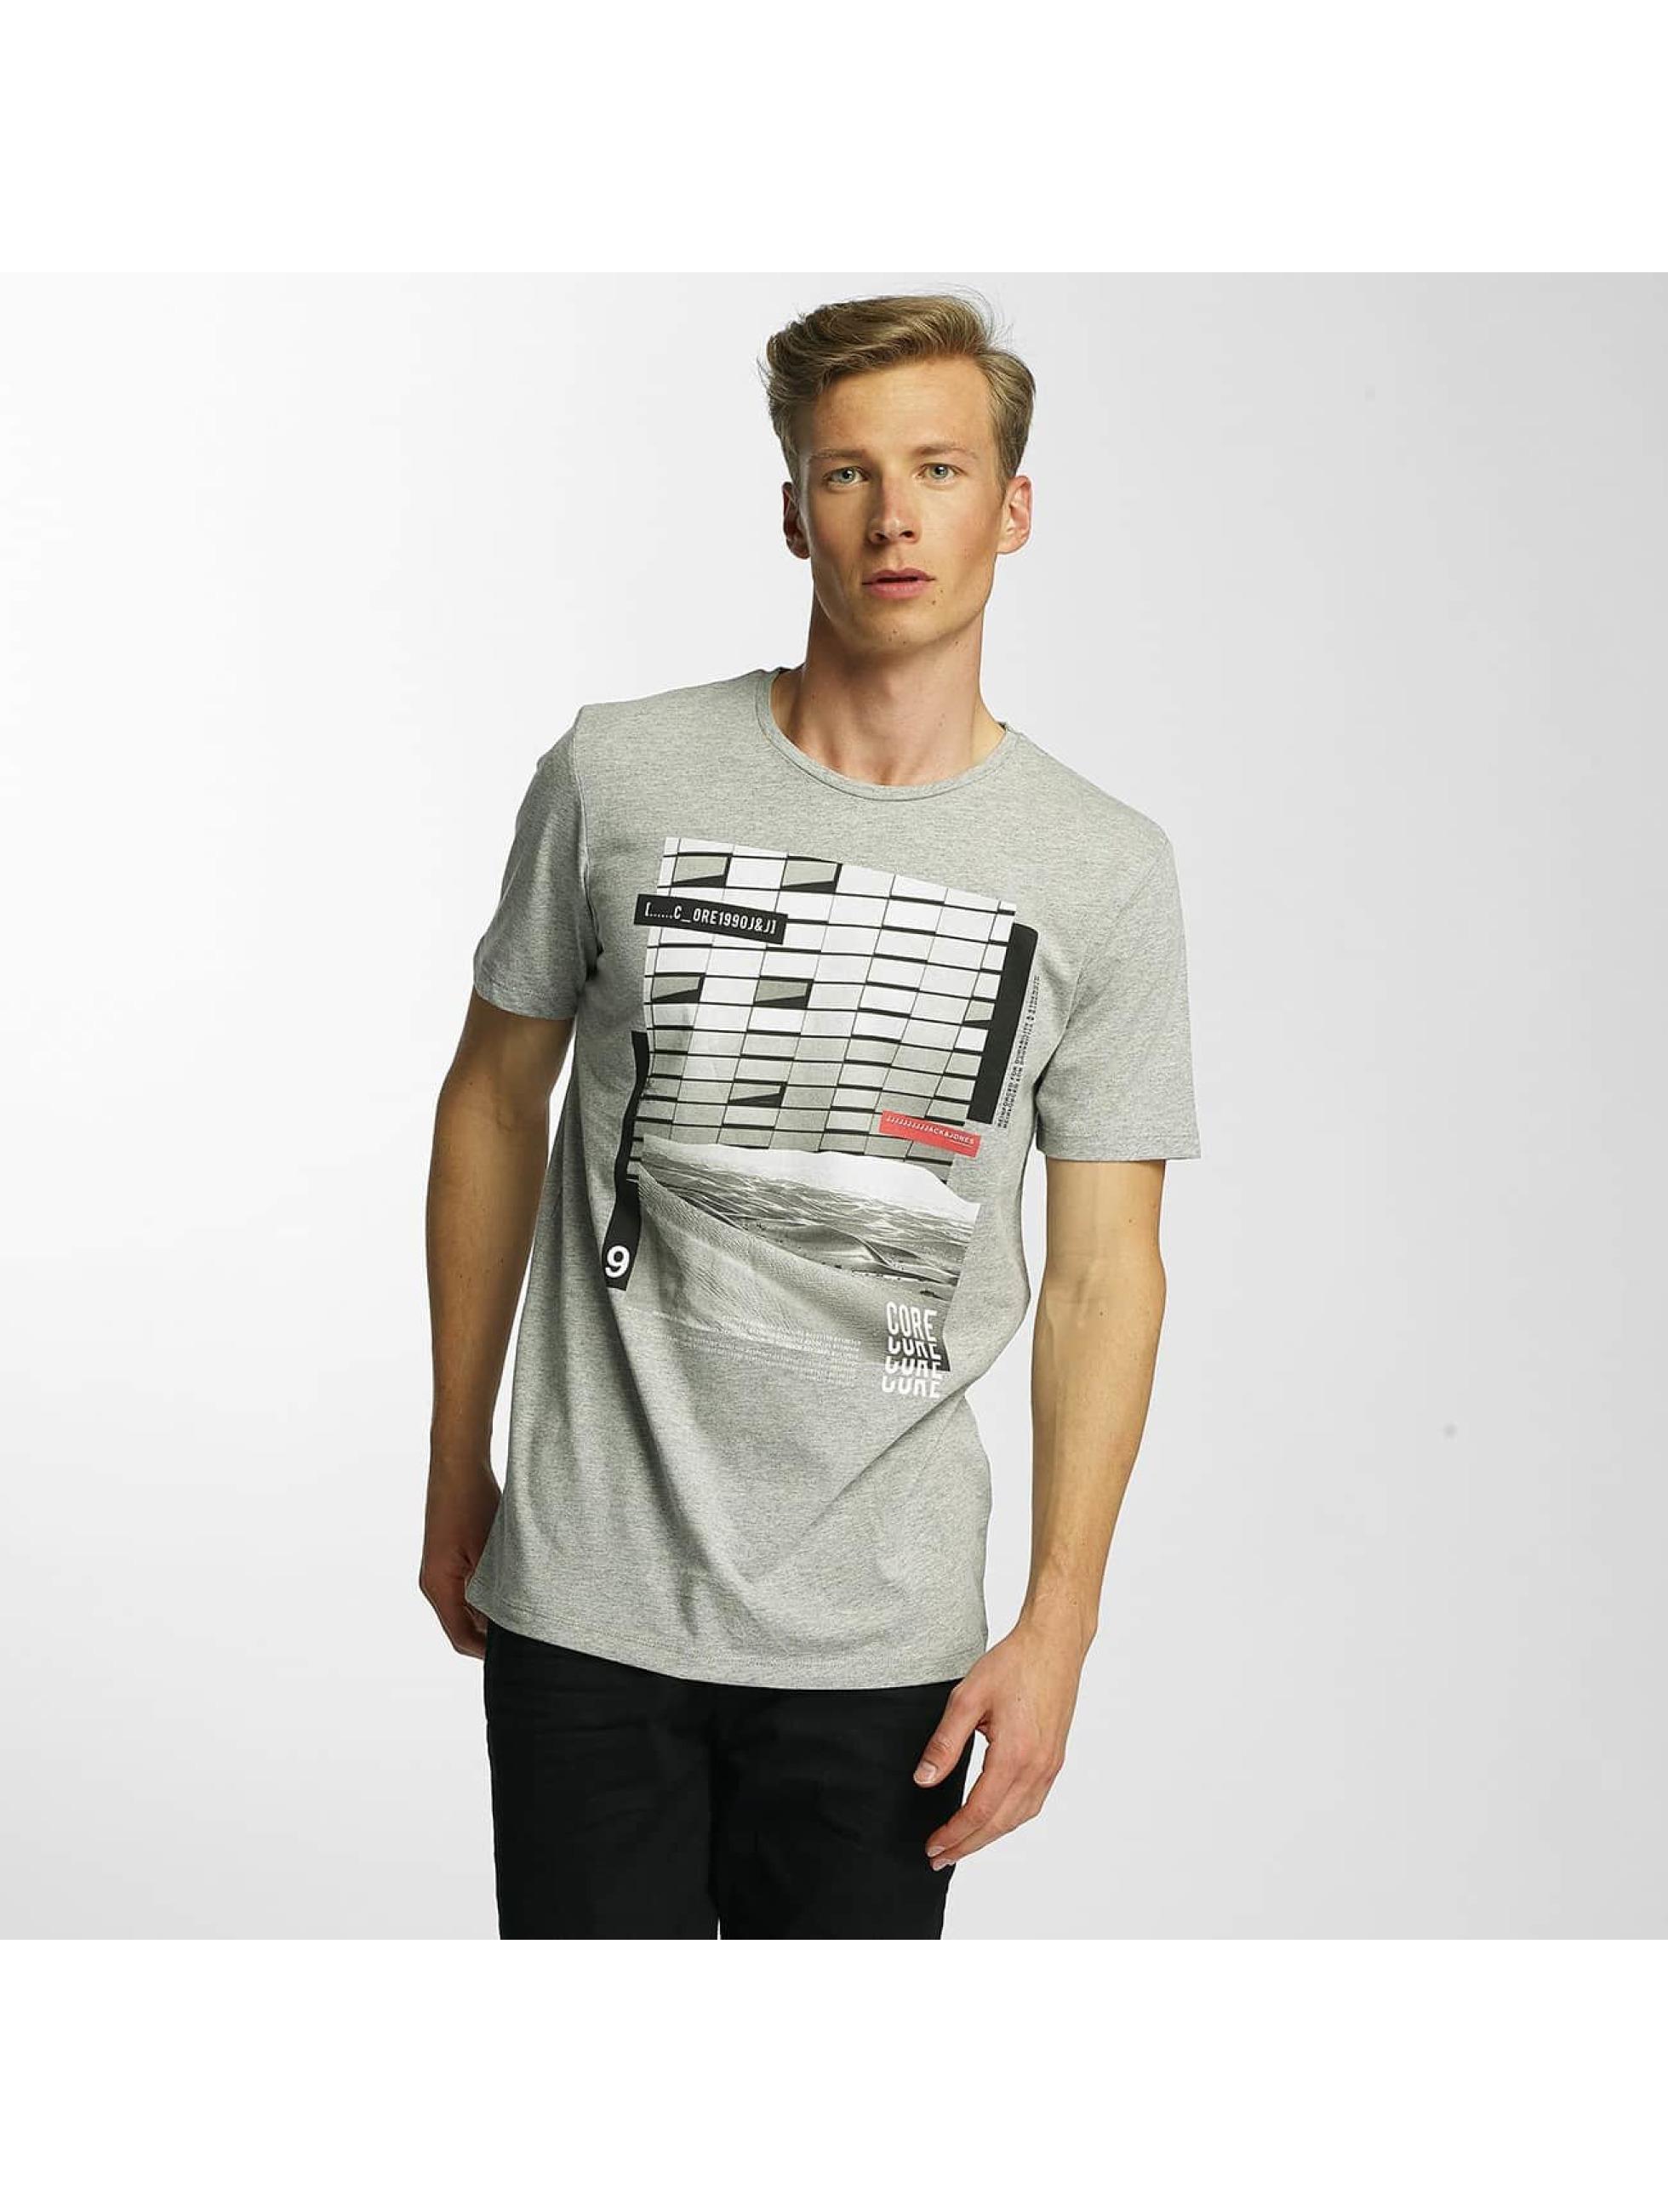 Jack-amp-Jones-Uomini-Maglieria-T-shirt-jcoCita